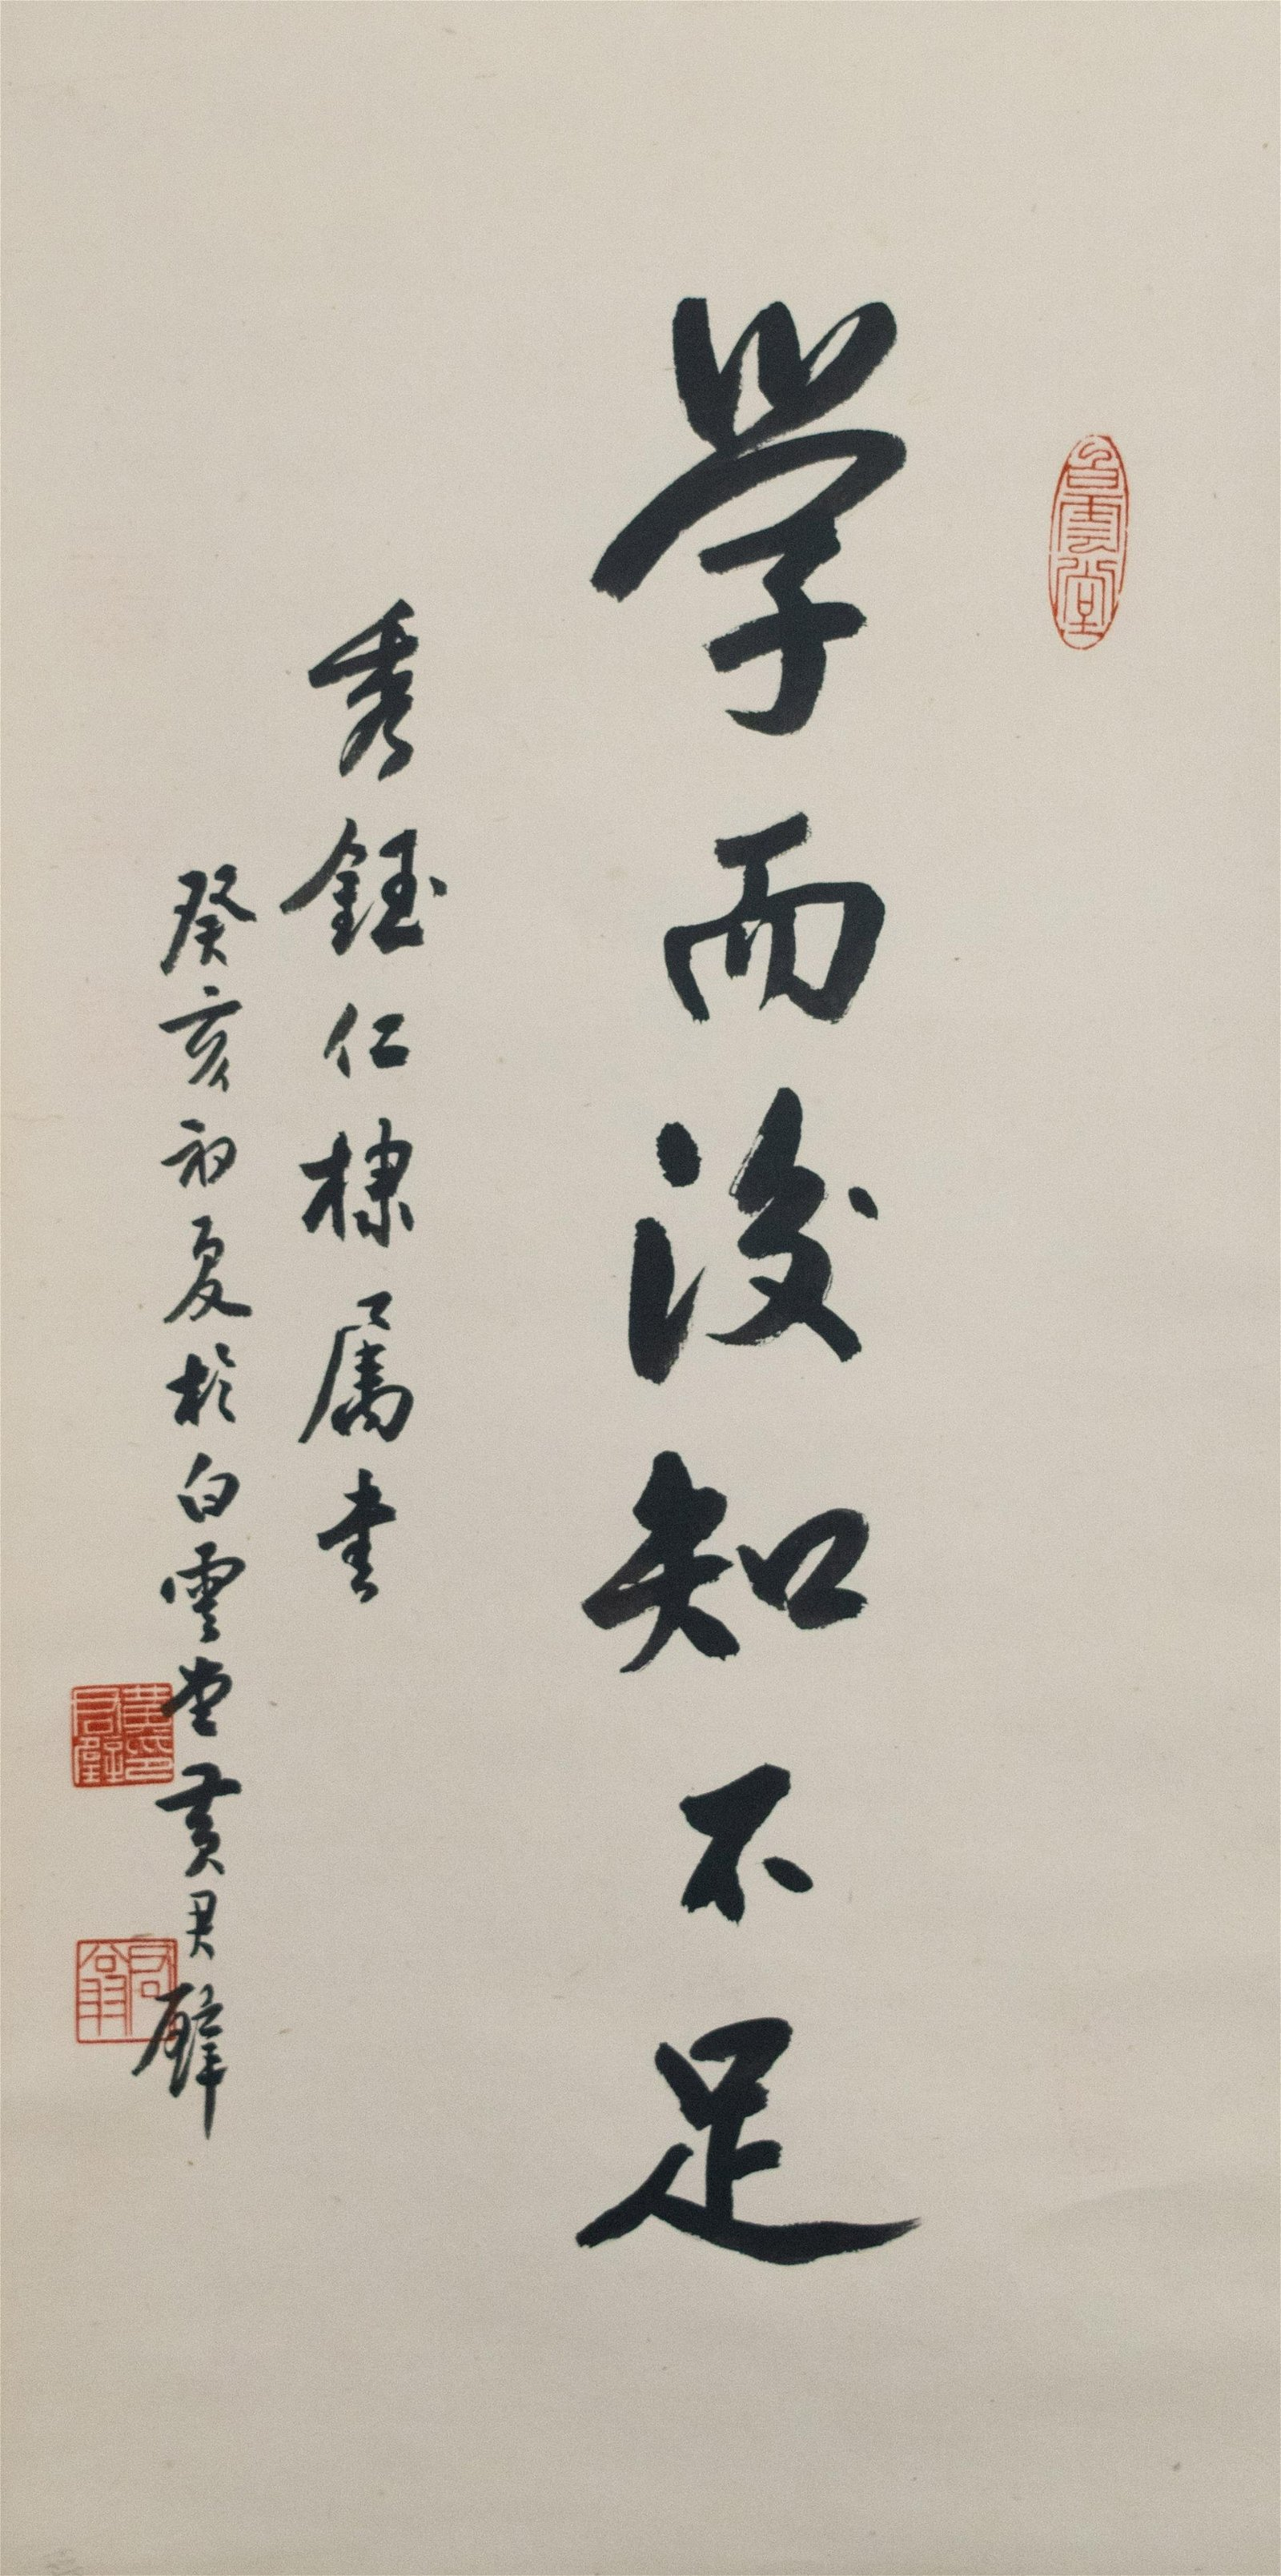 Calligraphy, Huang Junbi Dedicated to Xiu Yu